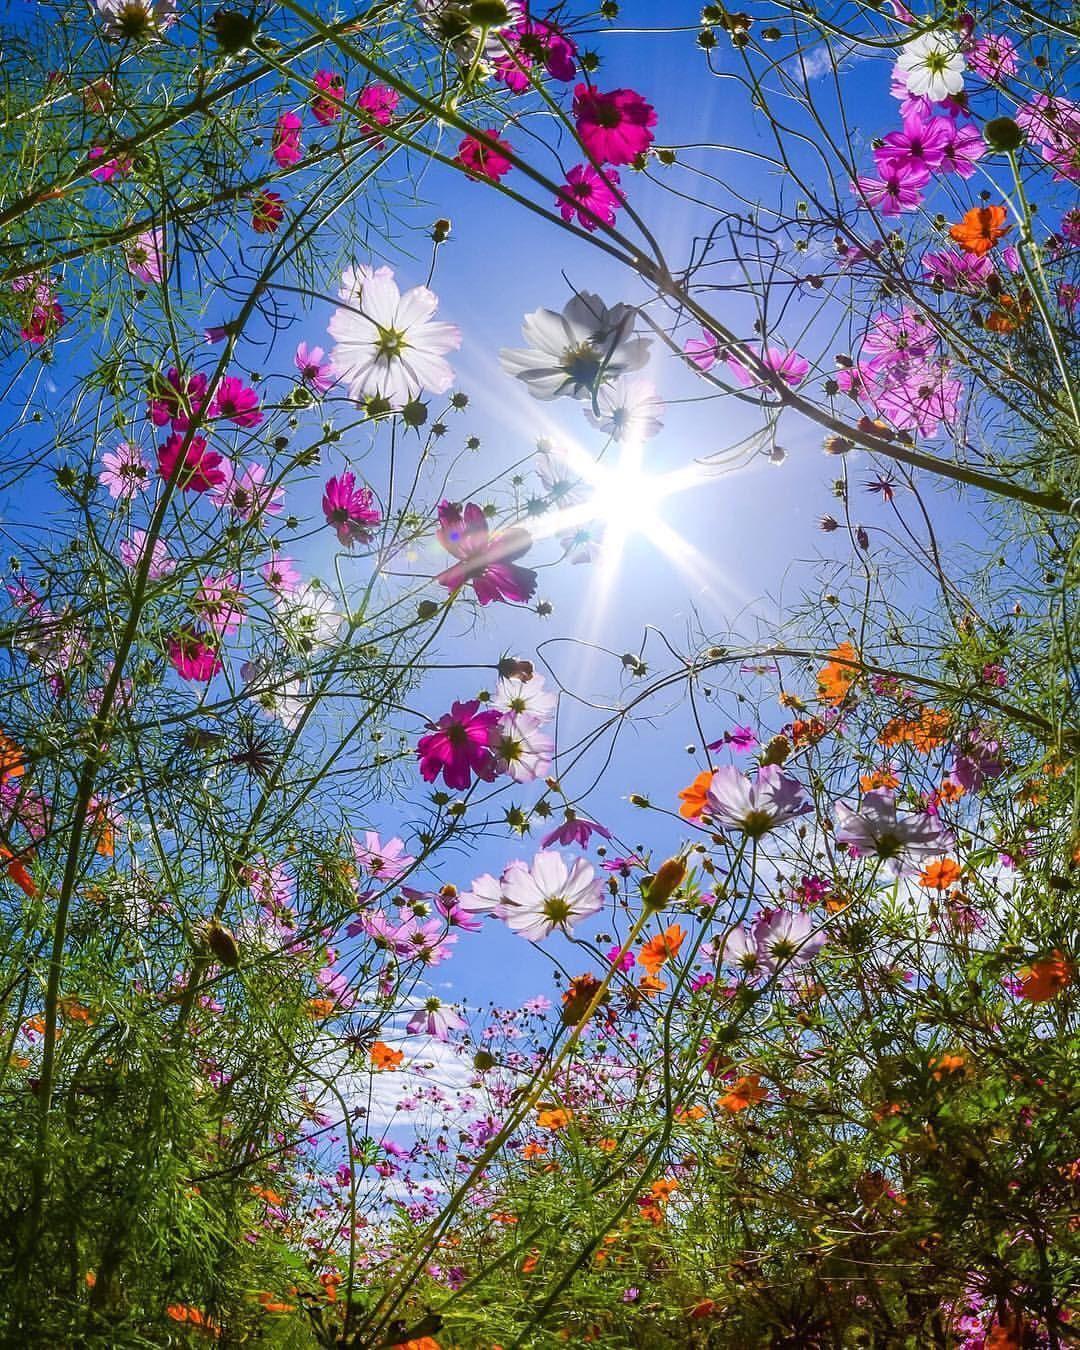 Photo By Kenken 728 Flowers Japan Beautifuldestinations Earth Wo Flowers Photography Beautiful Flowers Amazing Flowers